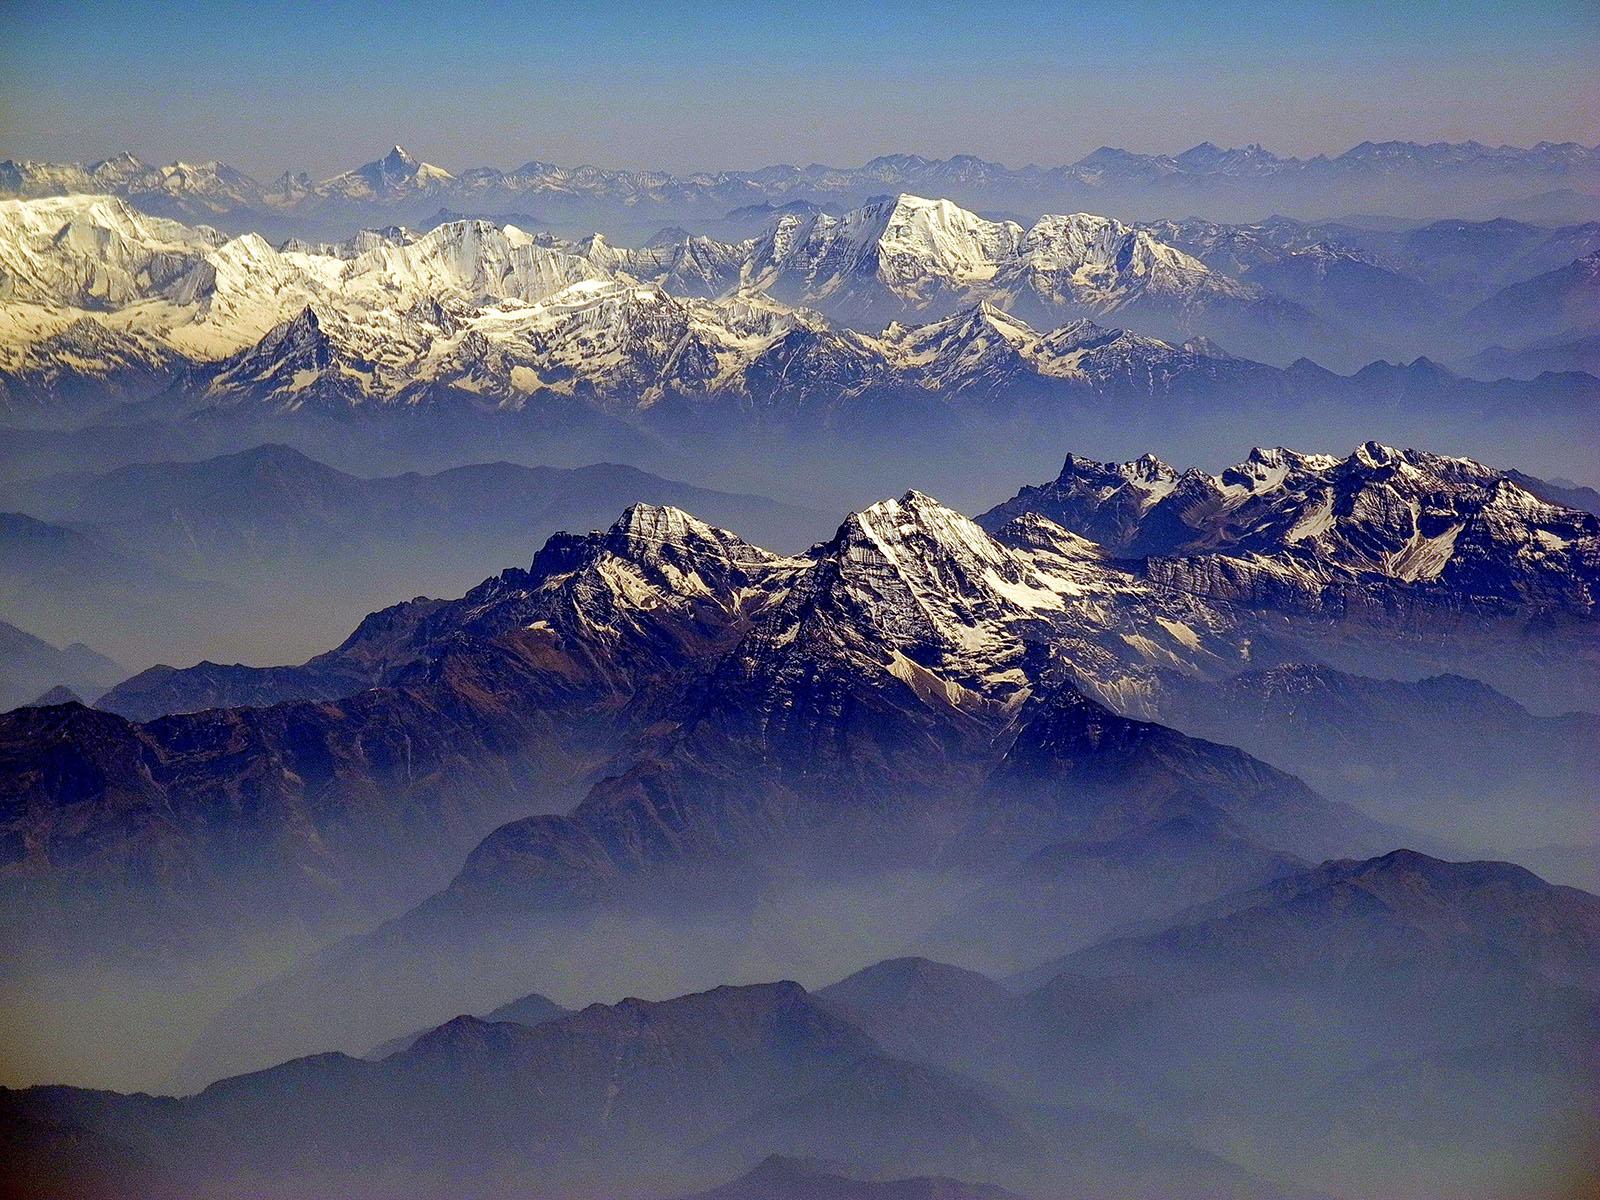 Fine-Tuned India-Asia Collision Cools Earth for Human Habitation